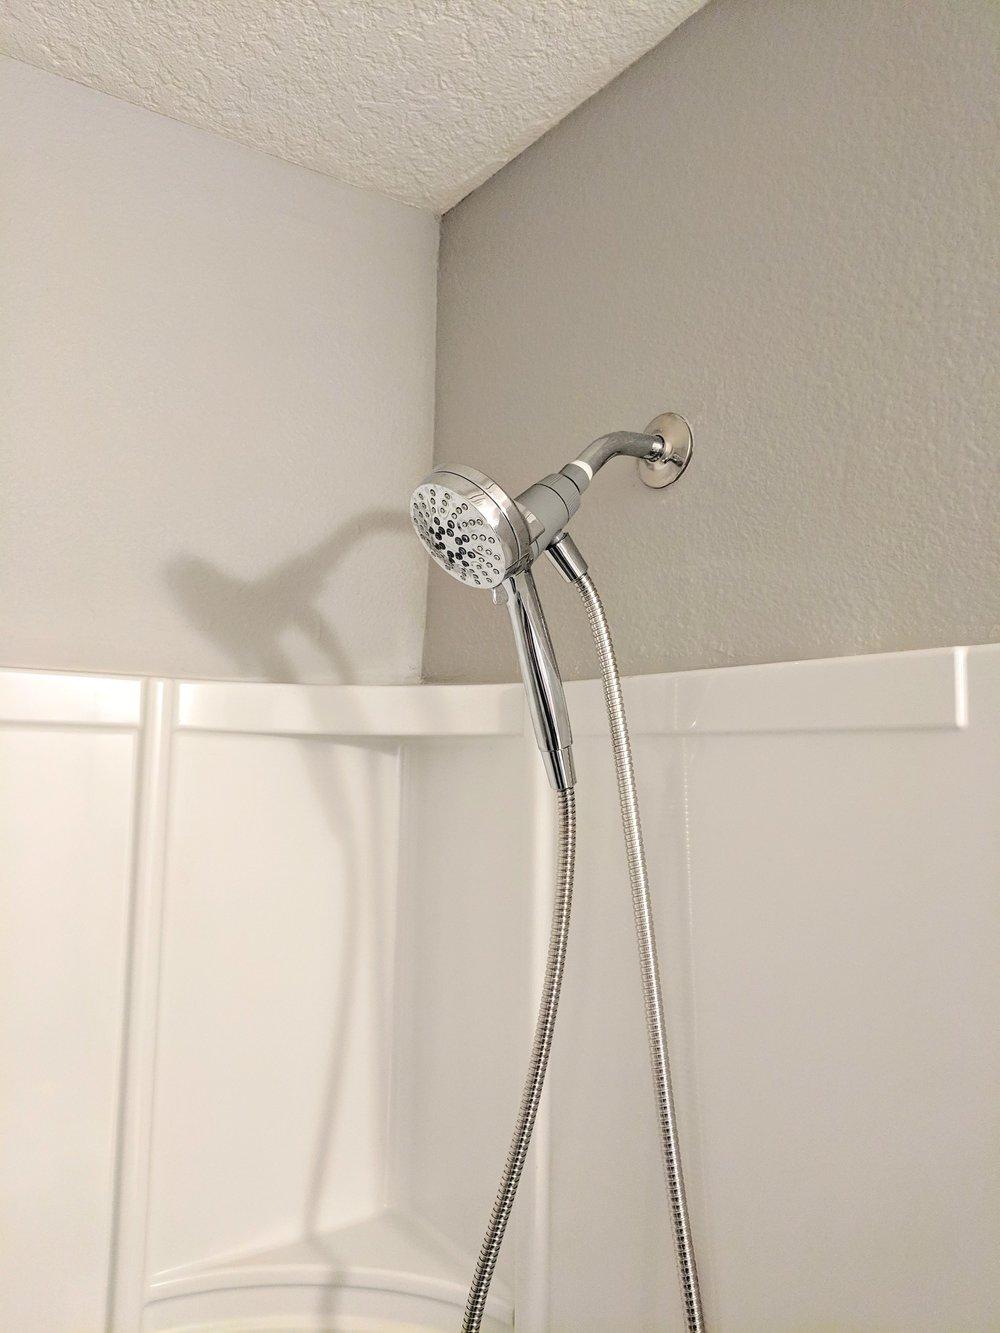 Enjoy your new shower head!